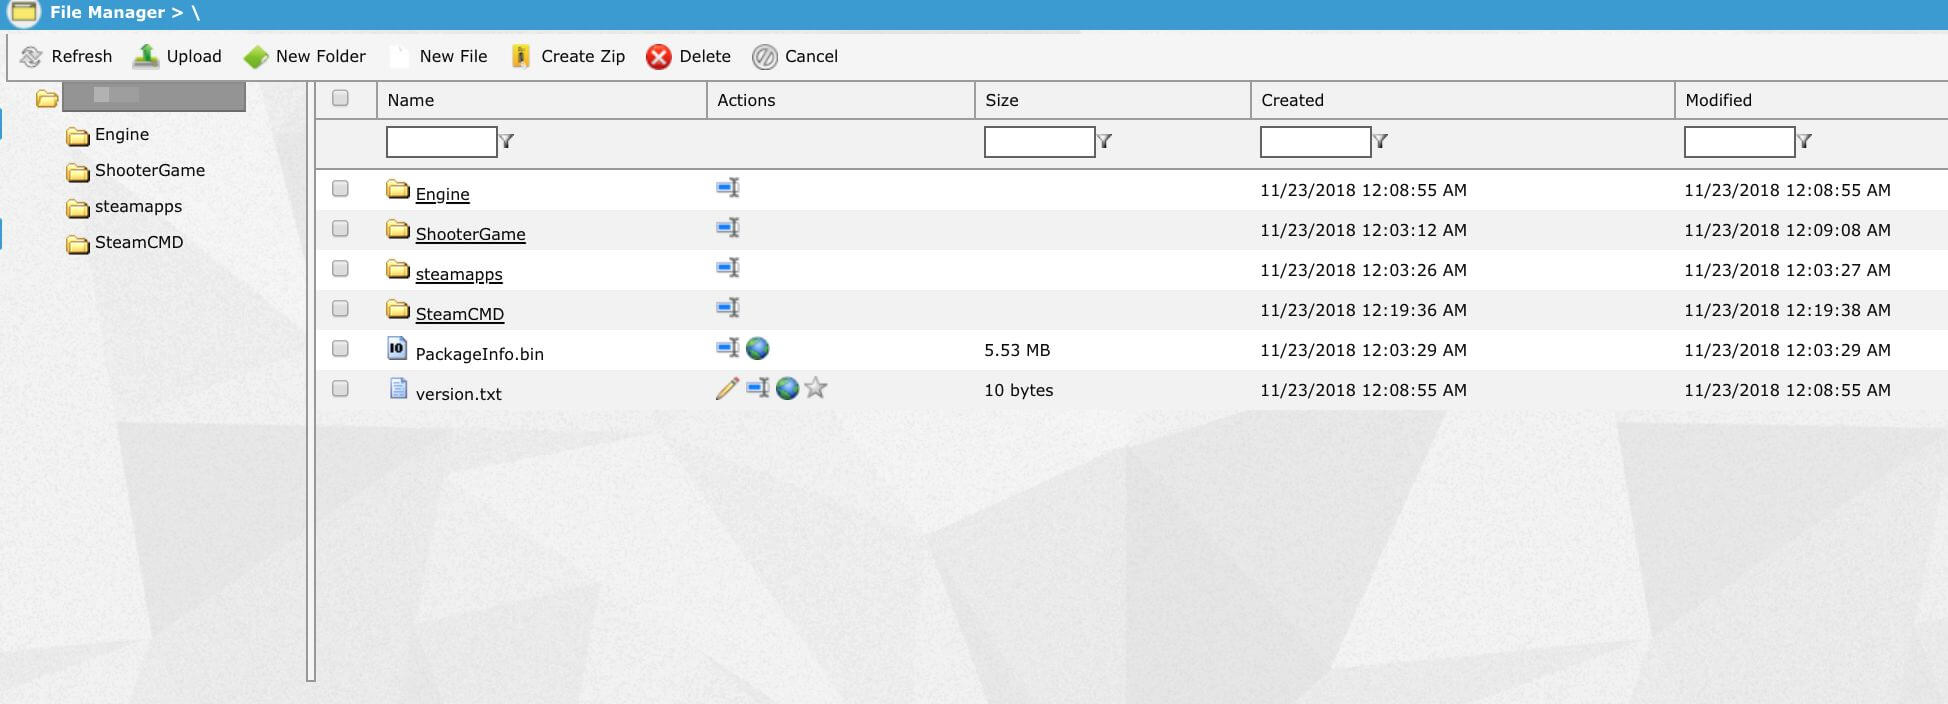 ServerBlend Rust Server Hosting Information and Reviews